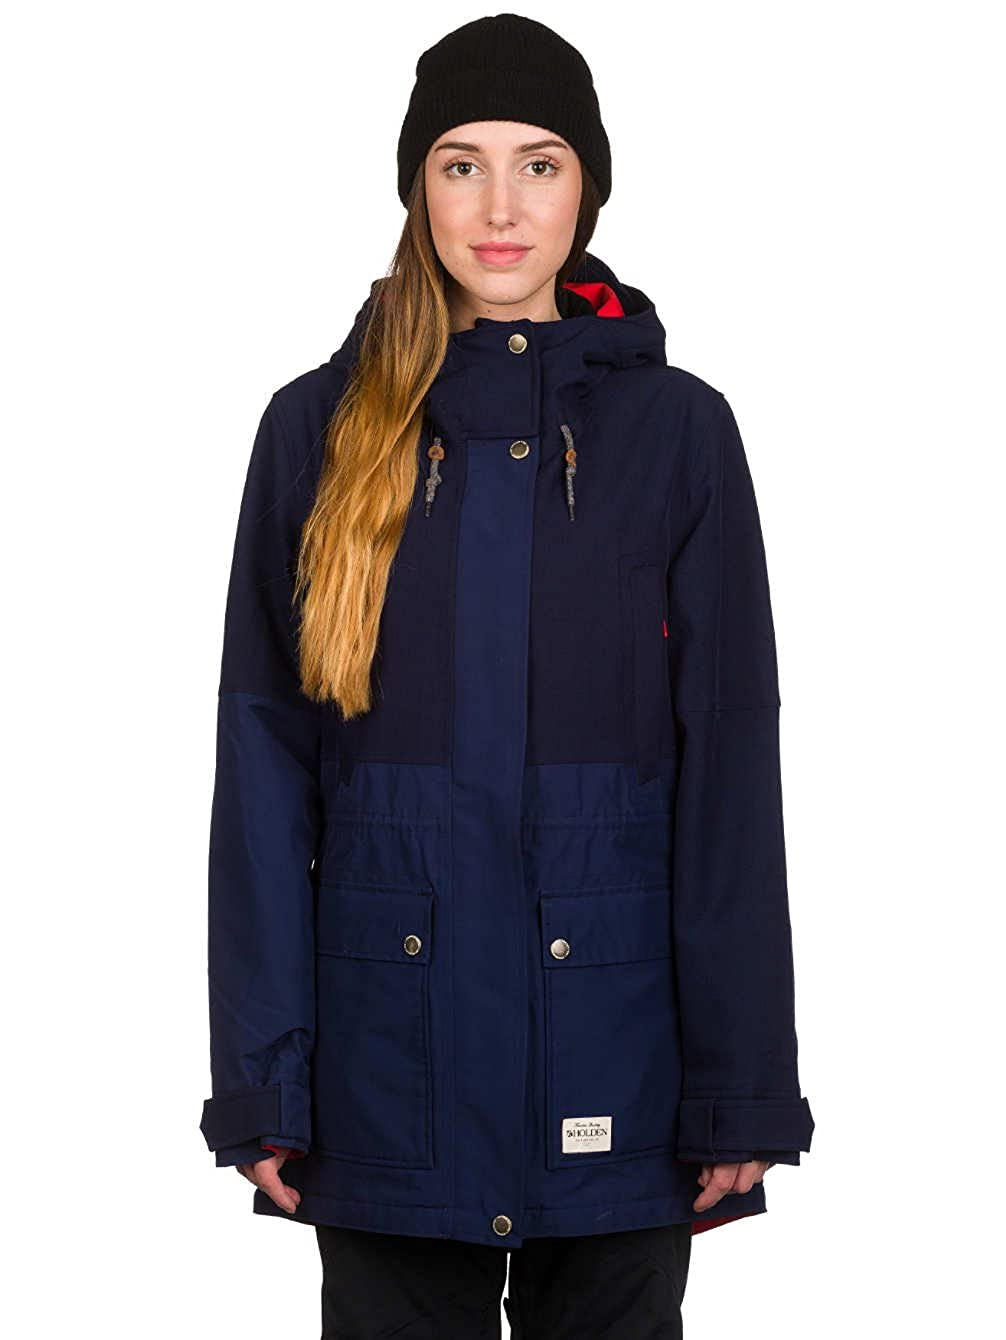 25176b214 Holden - Womens Shelter Parka Snow Jacket 2016